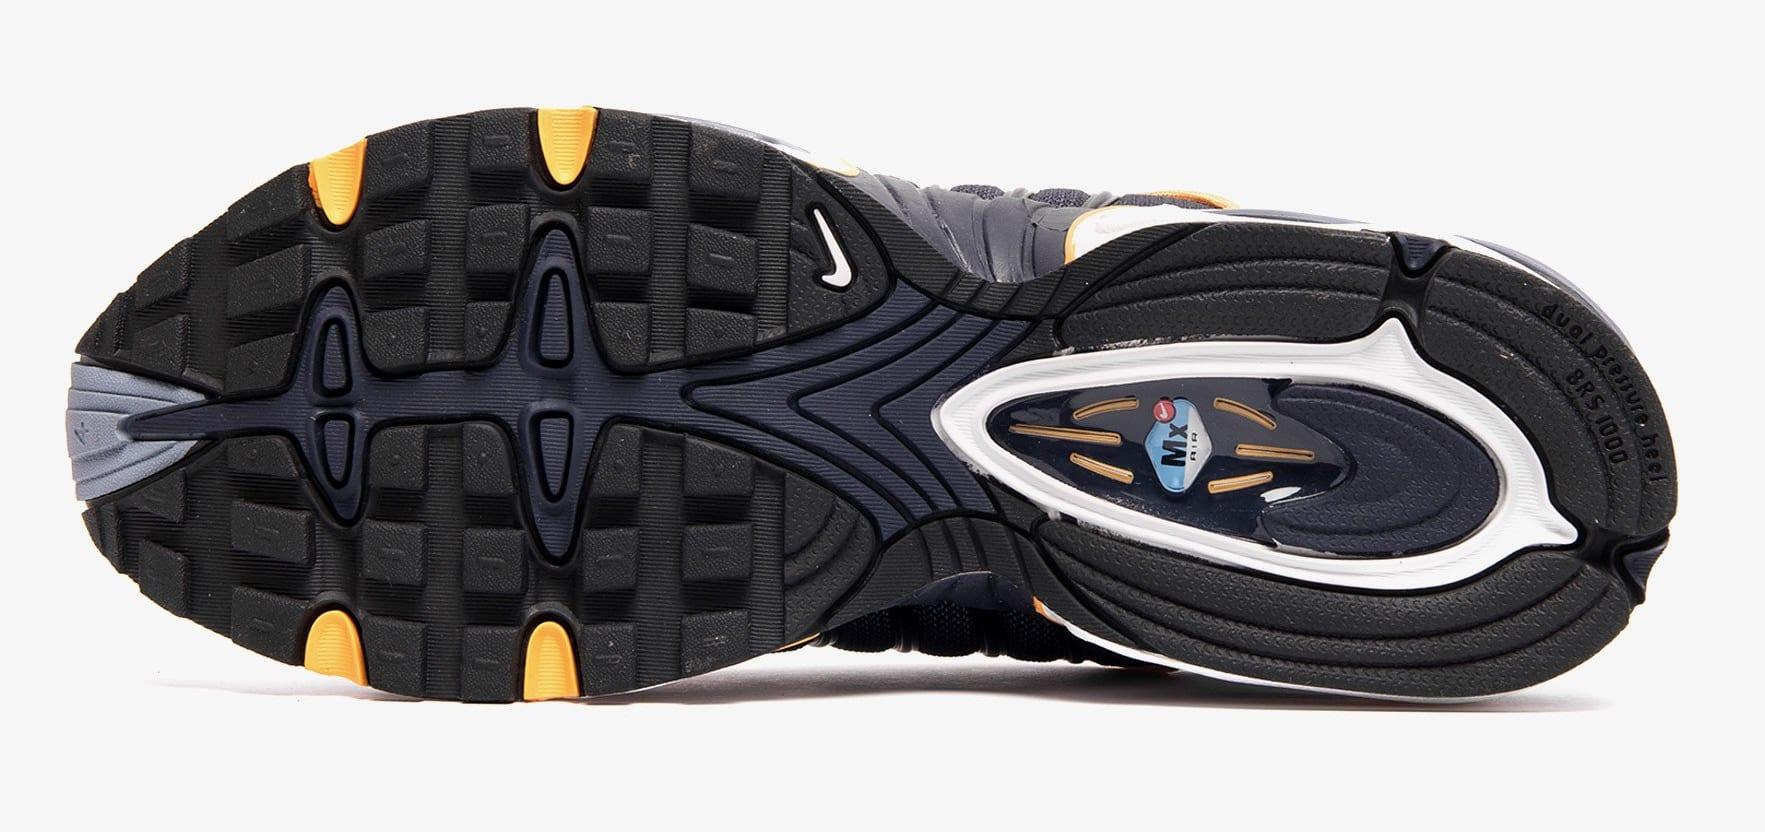 Nike Air Max Tailwind 4 AQ2567-001 (Bottom)